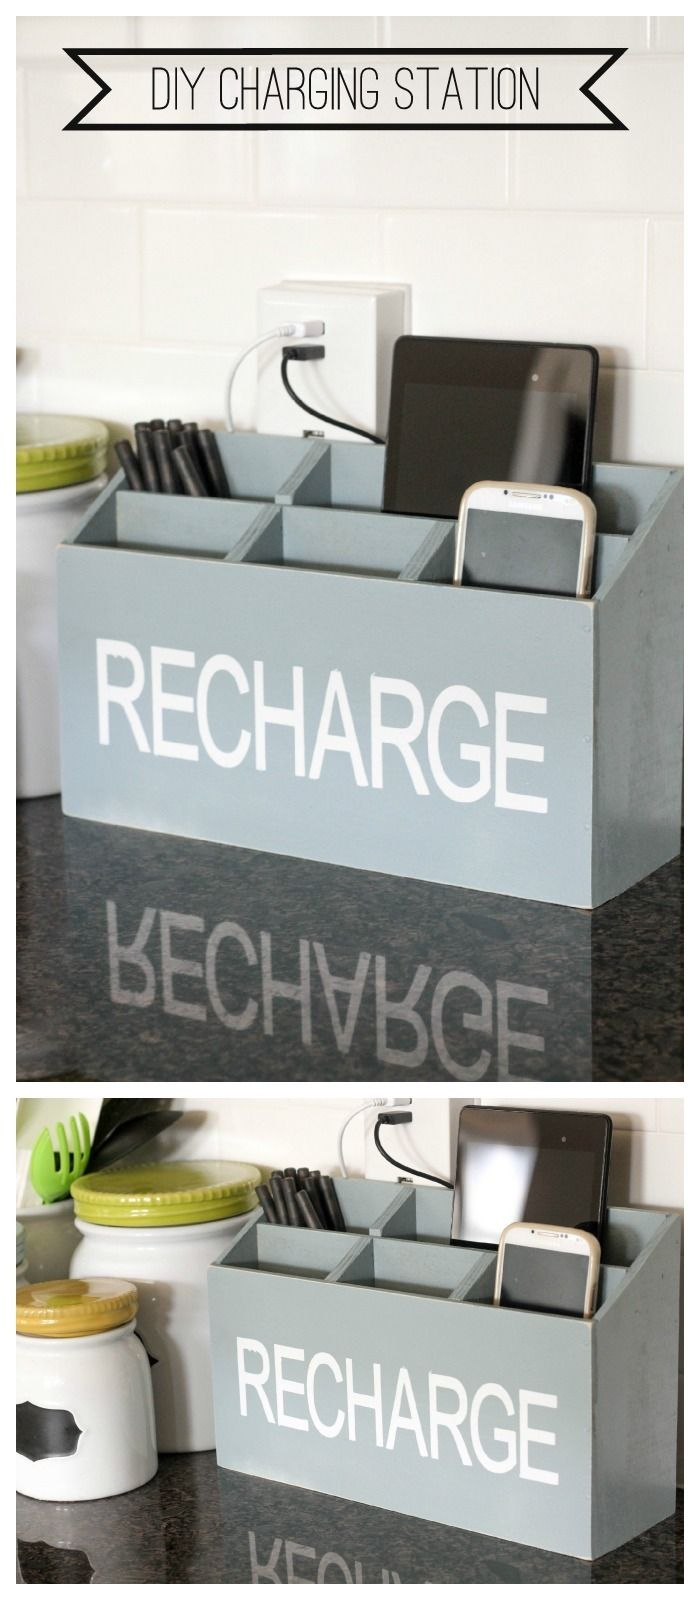 ladestation tablet handy alles in ordnung pinterest handy ladestation praktisch und. Black Bedroom Furniture Sets. Home Design Ideas